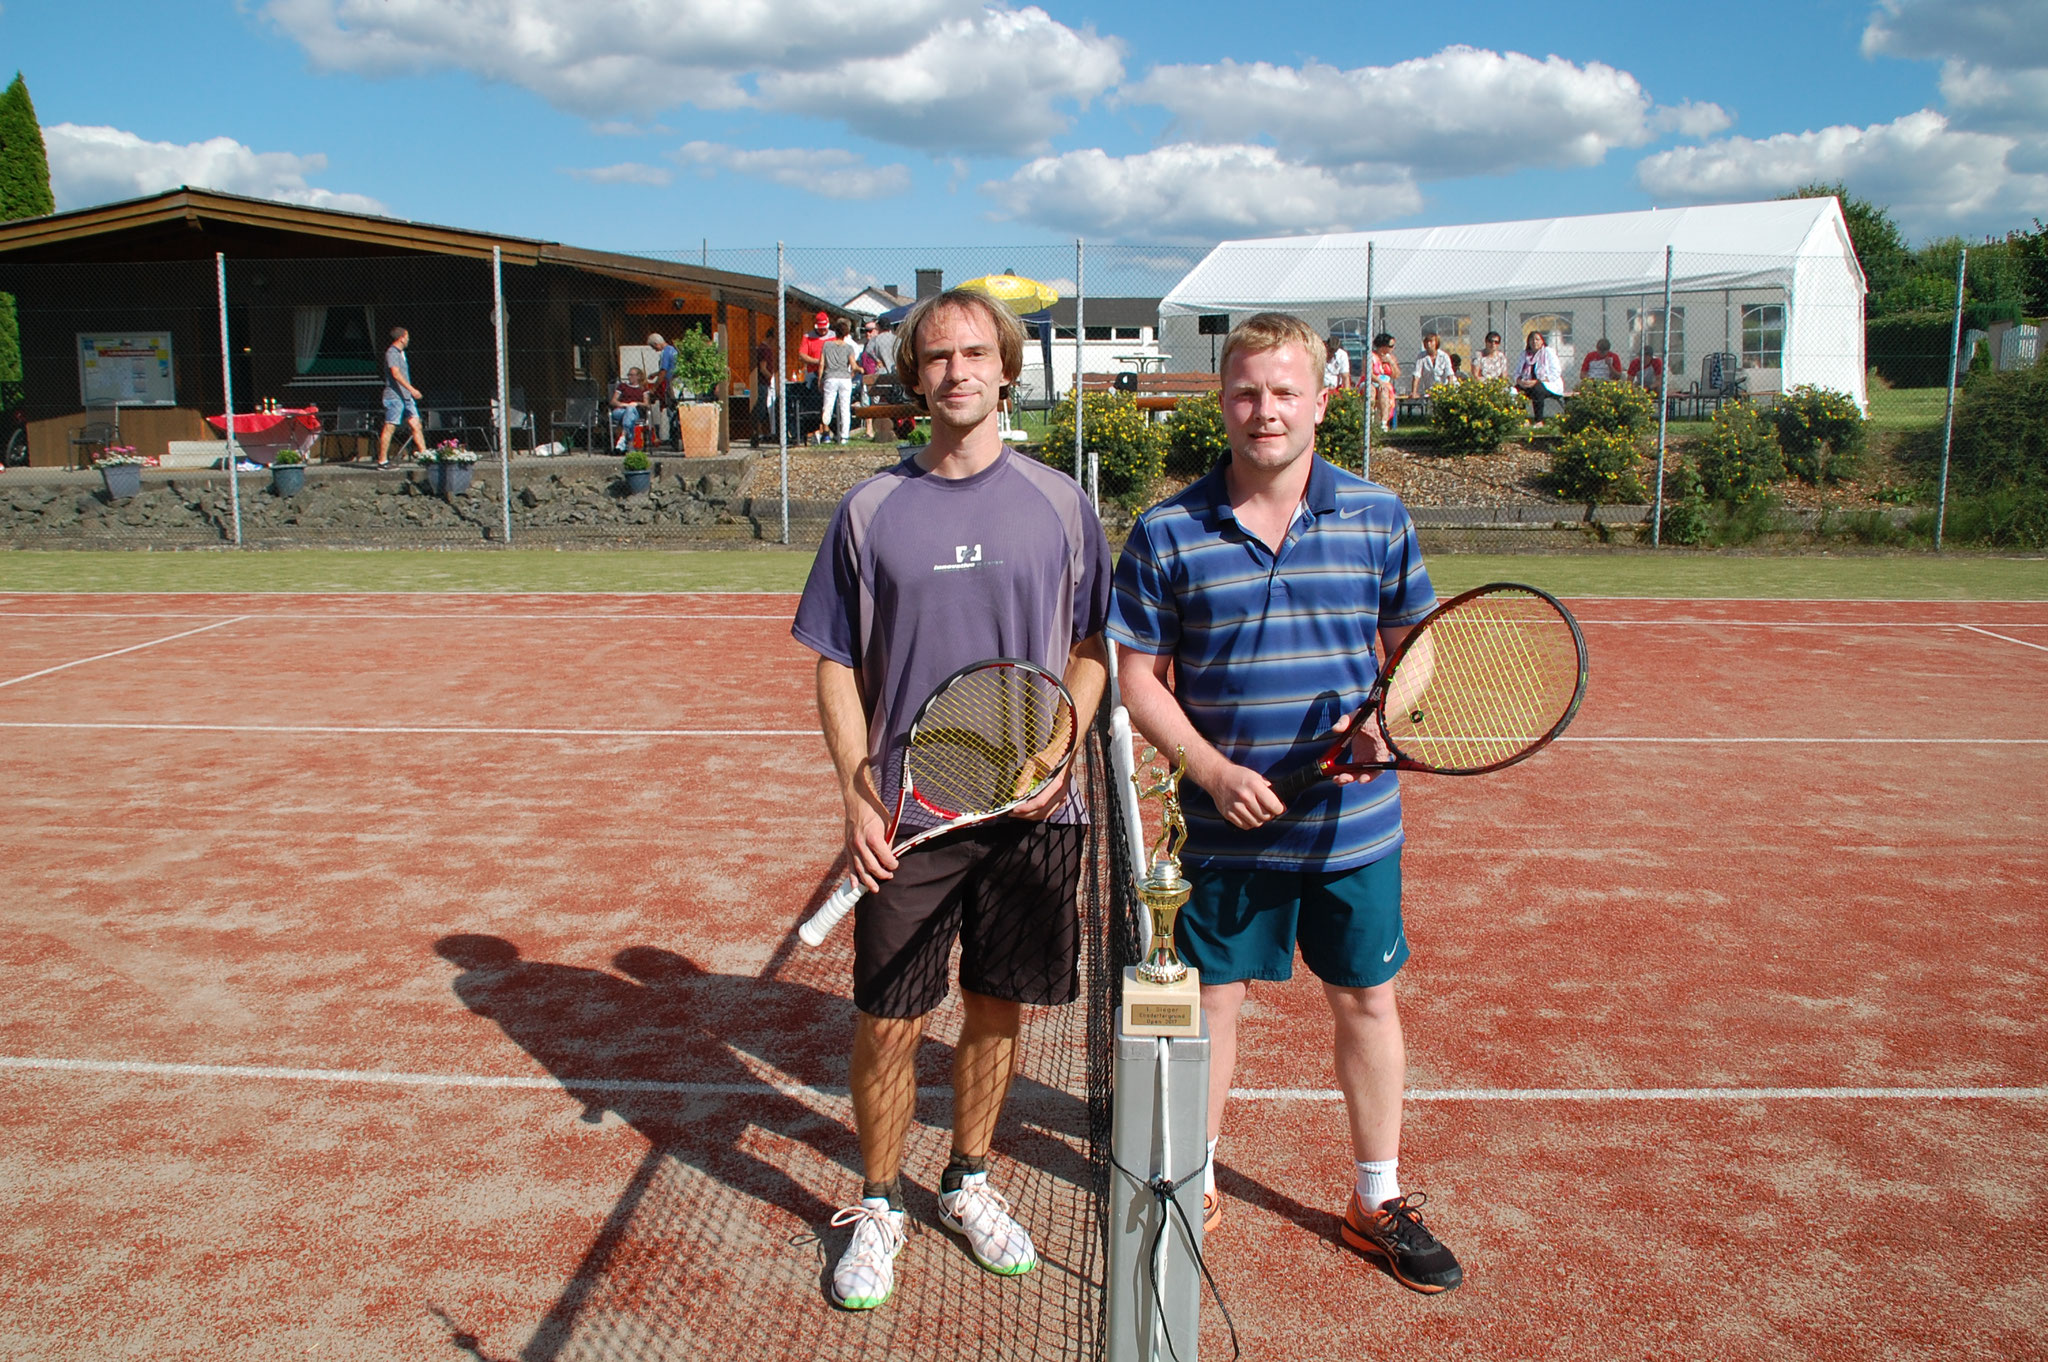 Finalisten: Bastian Christ / Sascha Heinmoeller